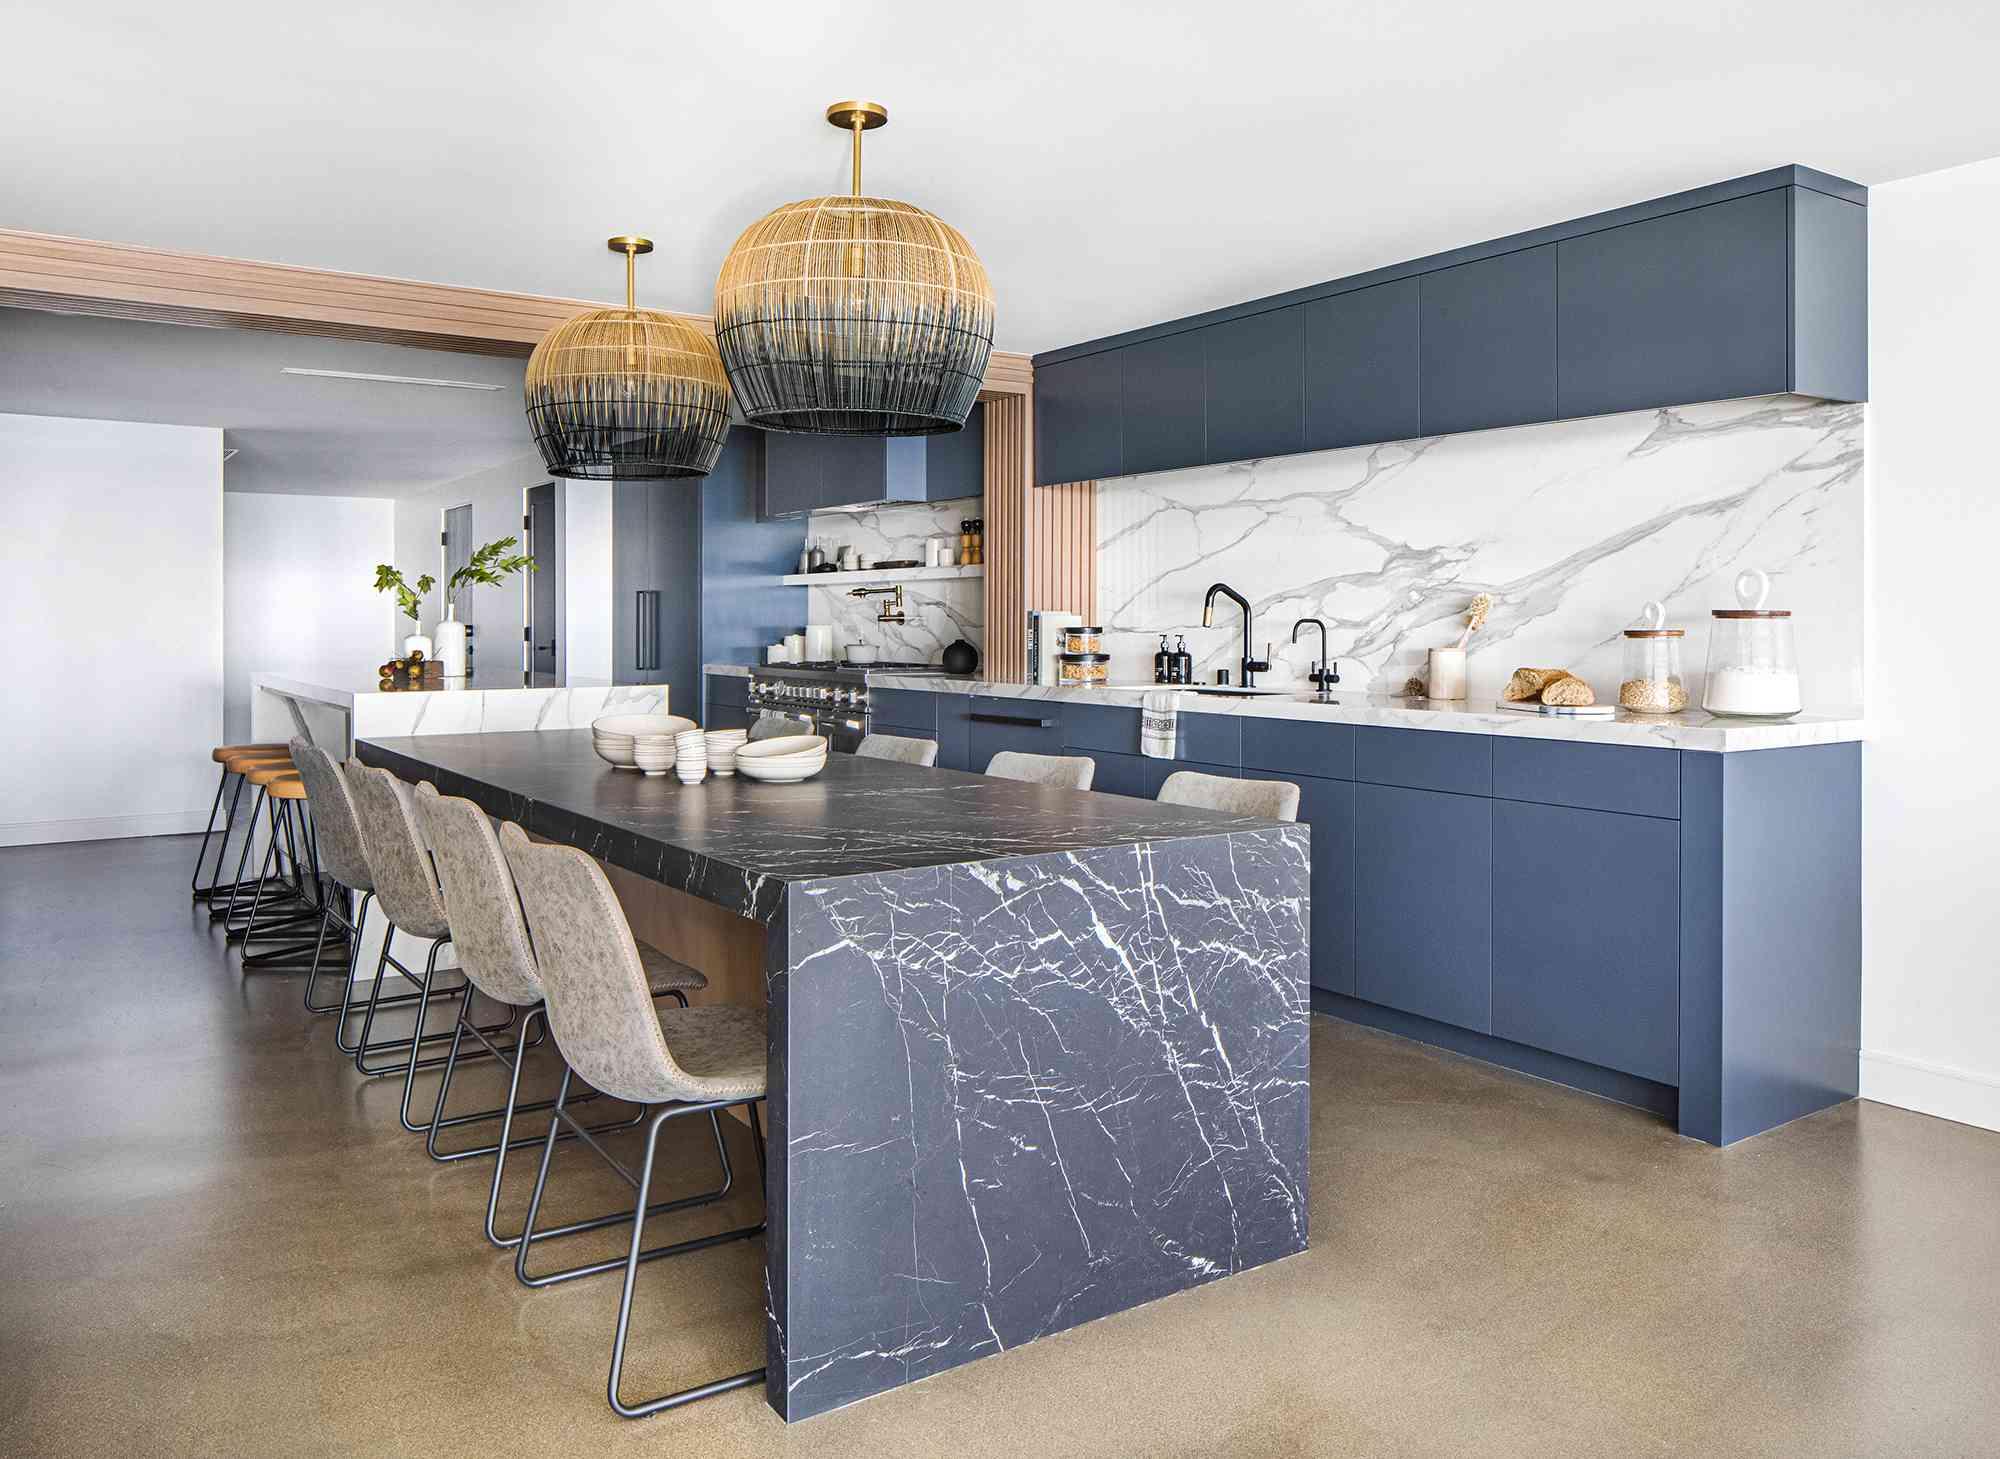 21 Beautiful Modern Kitchen Décor And Design Ideas